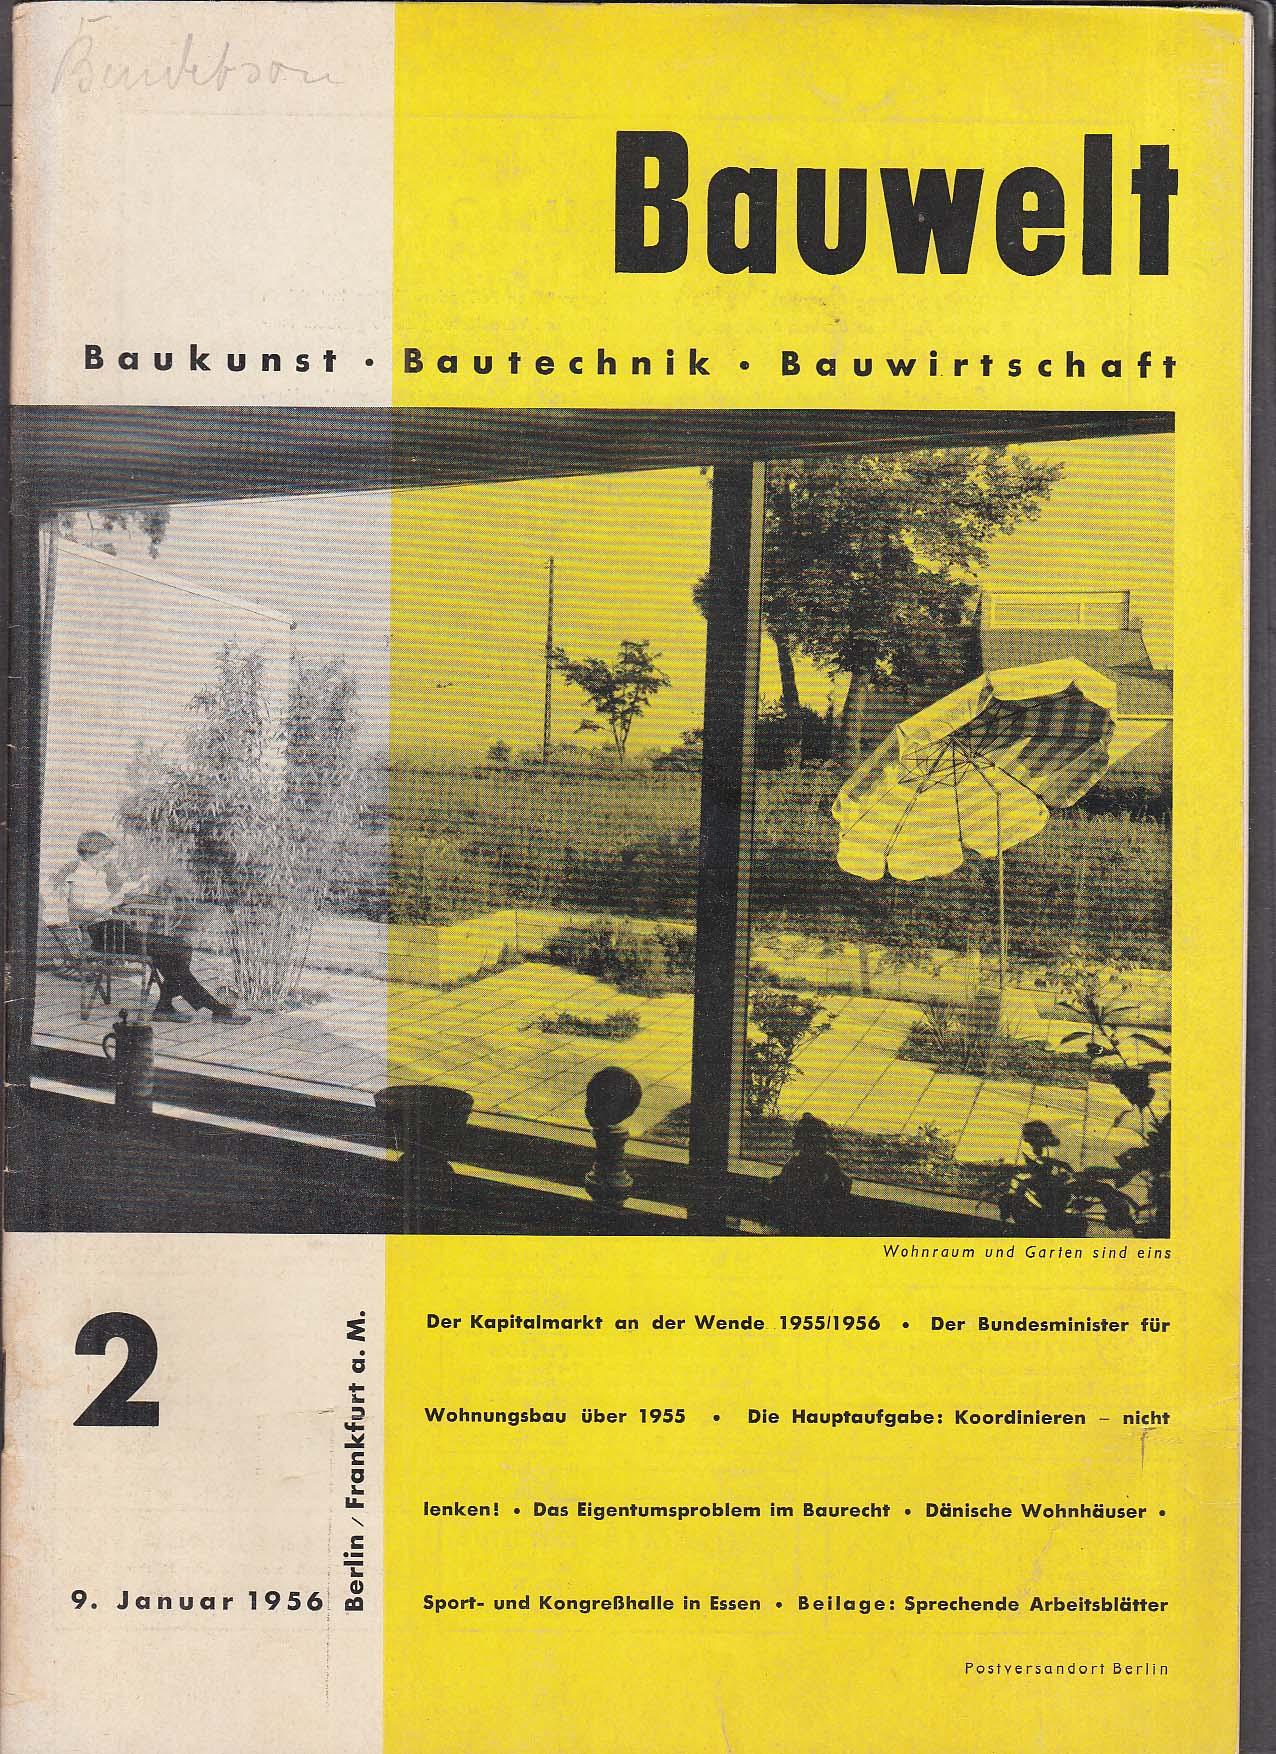 Bauwelt German architecture magazine 1/9/1956 2